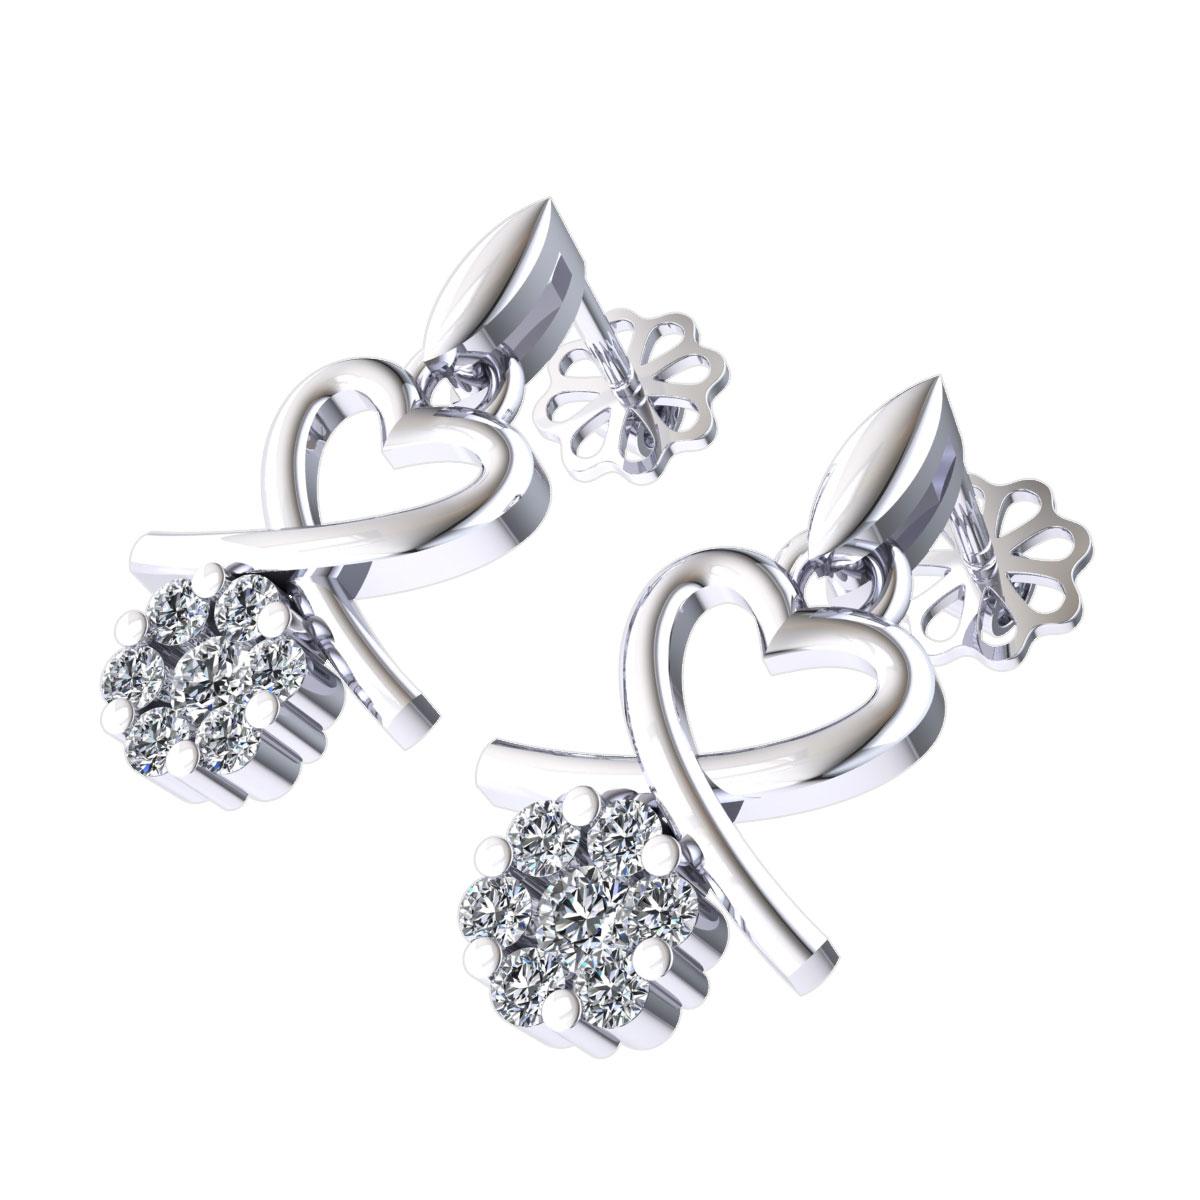 9640ad1af566 0-15ctw-Redondo-Brillante-Corte-Diamante-Mujer-Lazo-